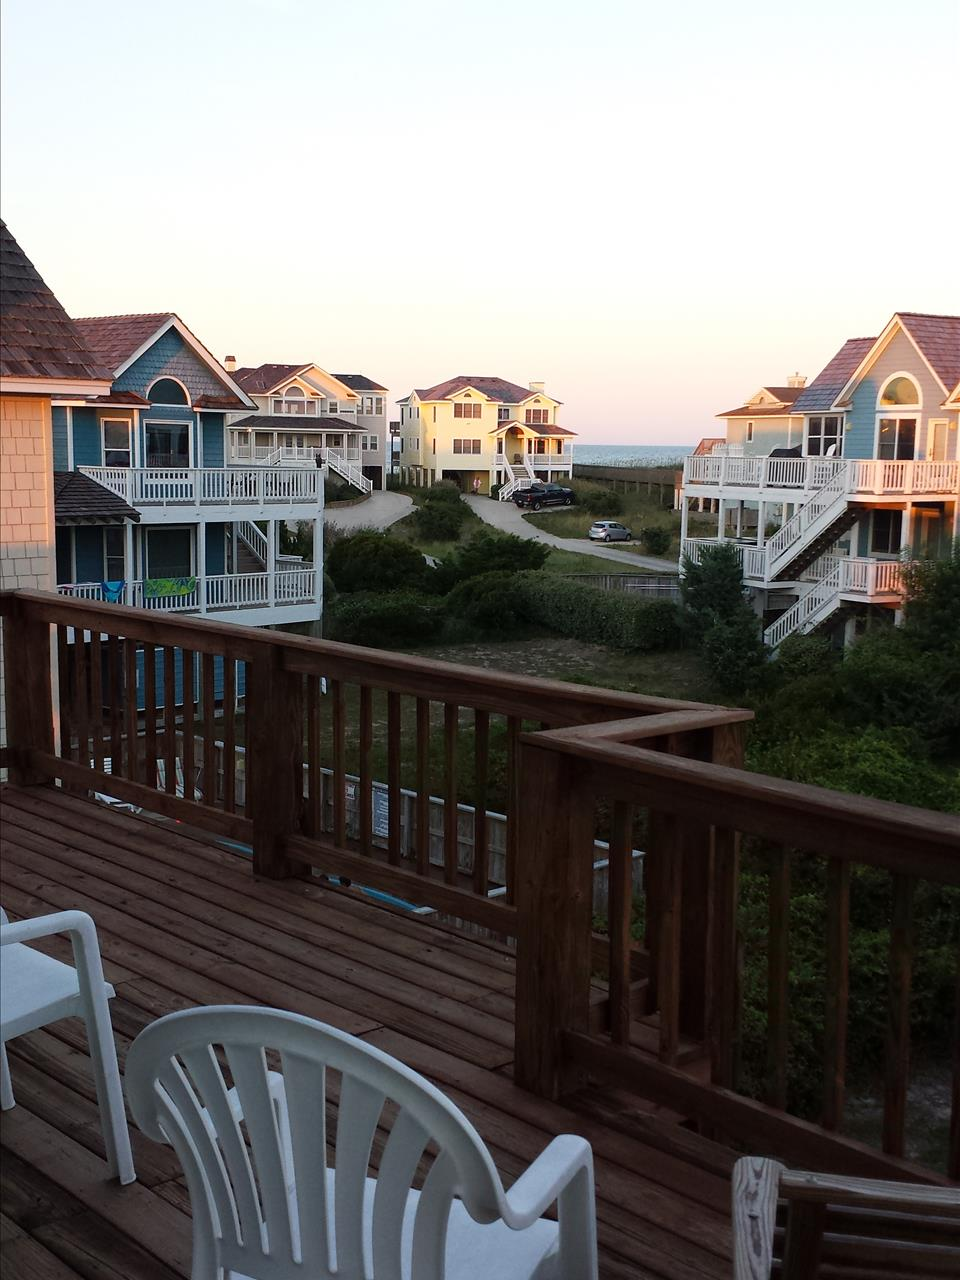 July 2015 Stay - SS58 - Seaside 58, Cheryl Sherman